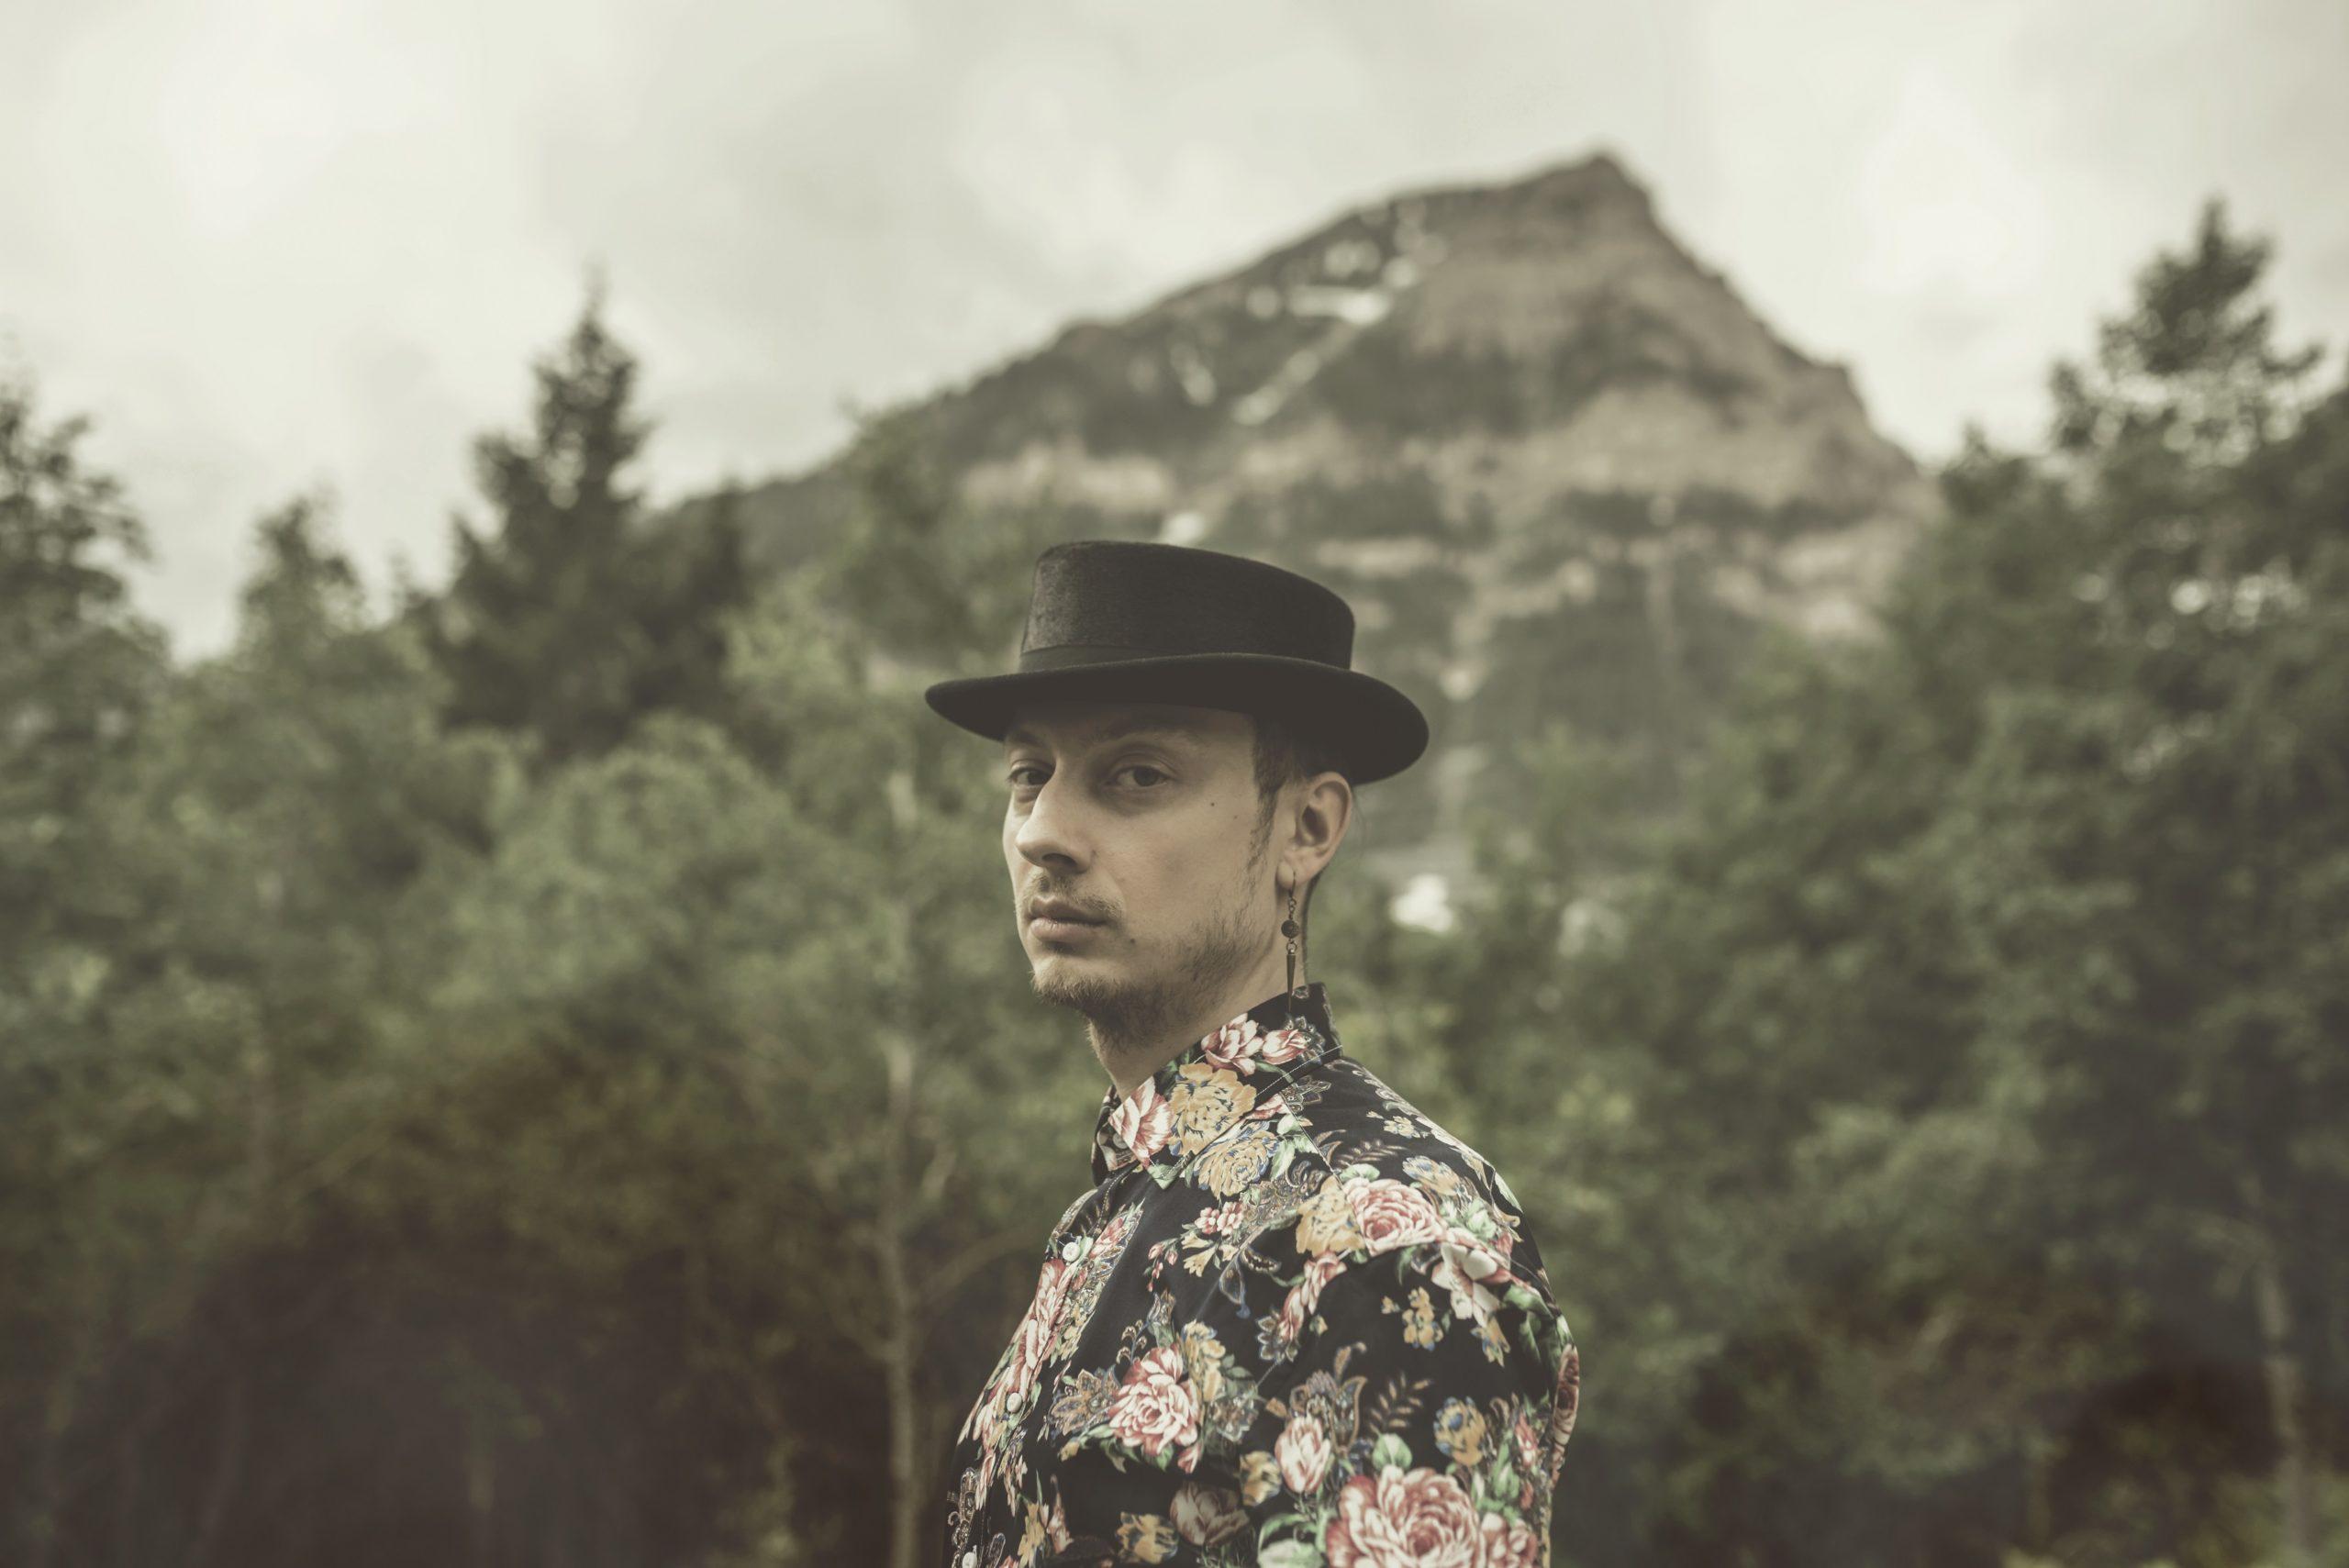 Serge Bulat releases Wurmenai: an album in the video game format